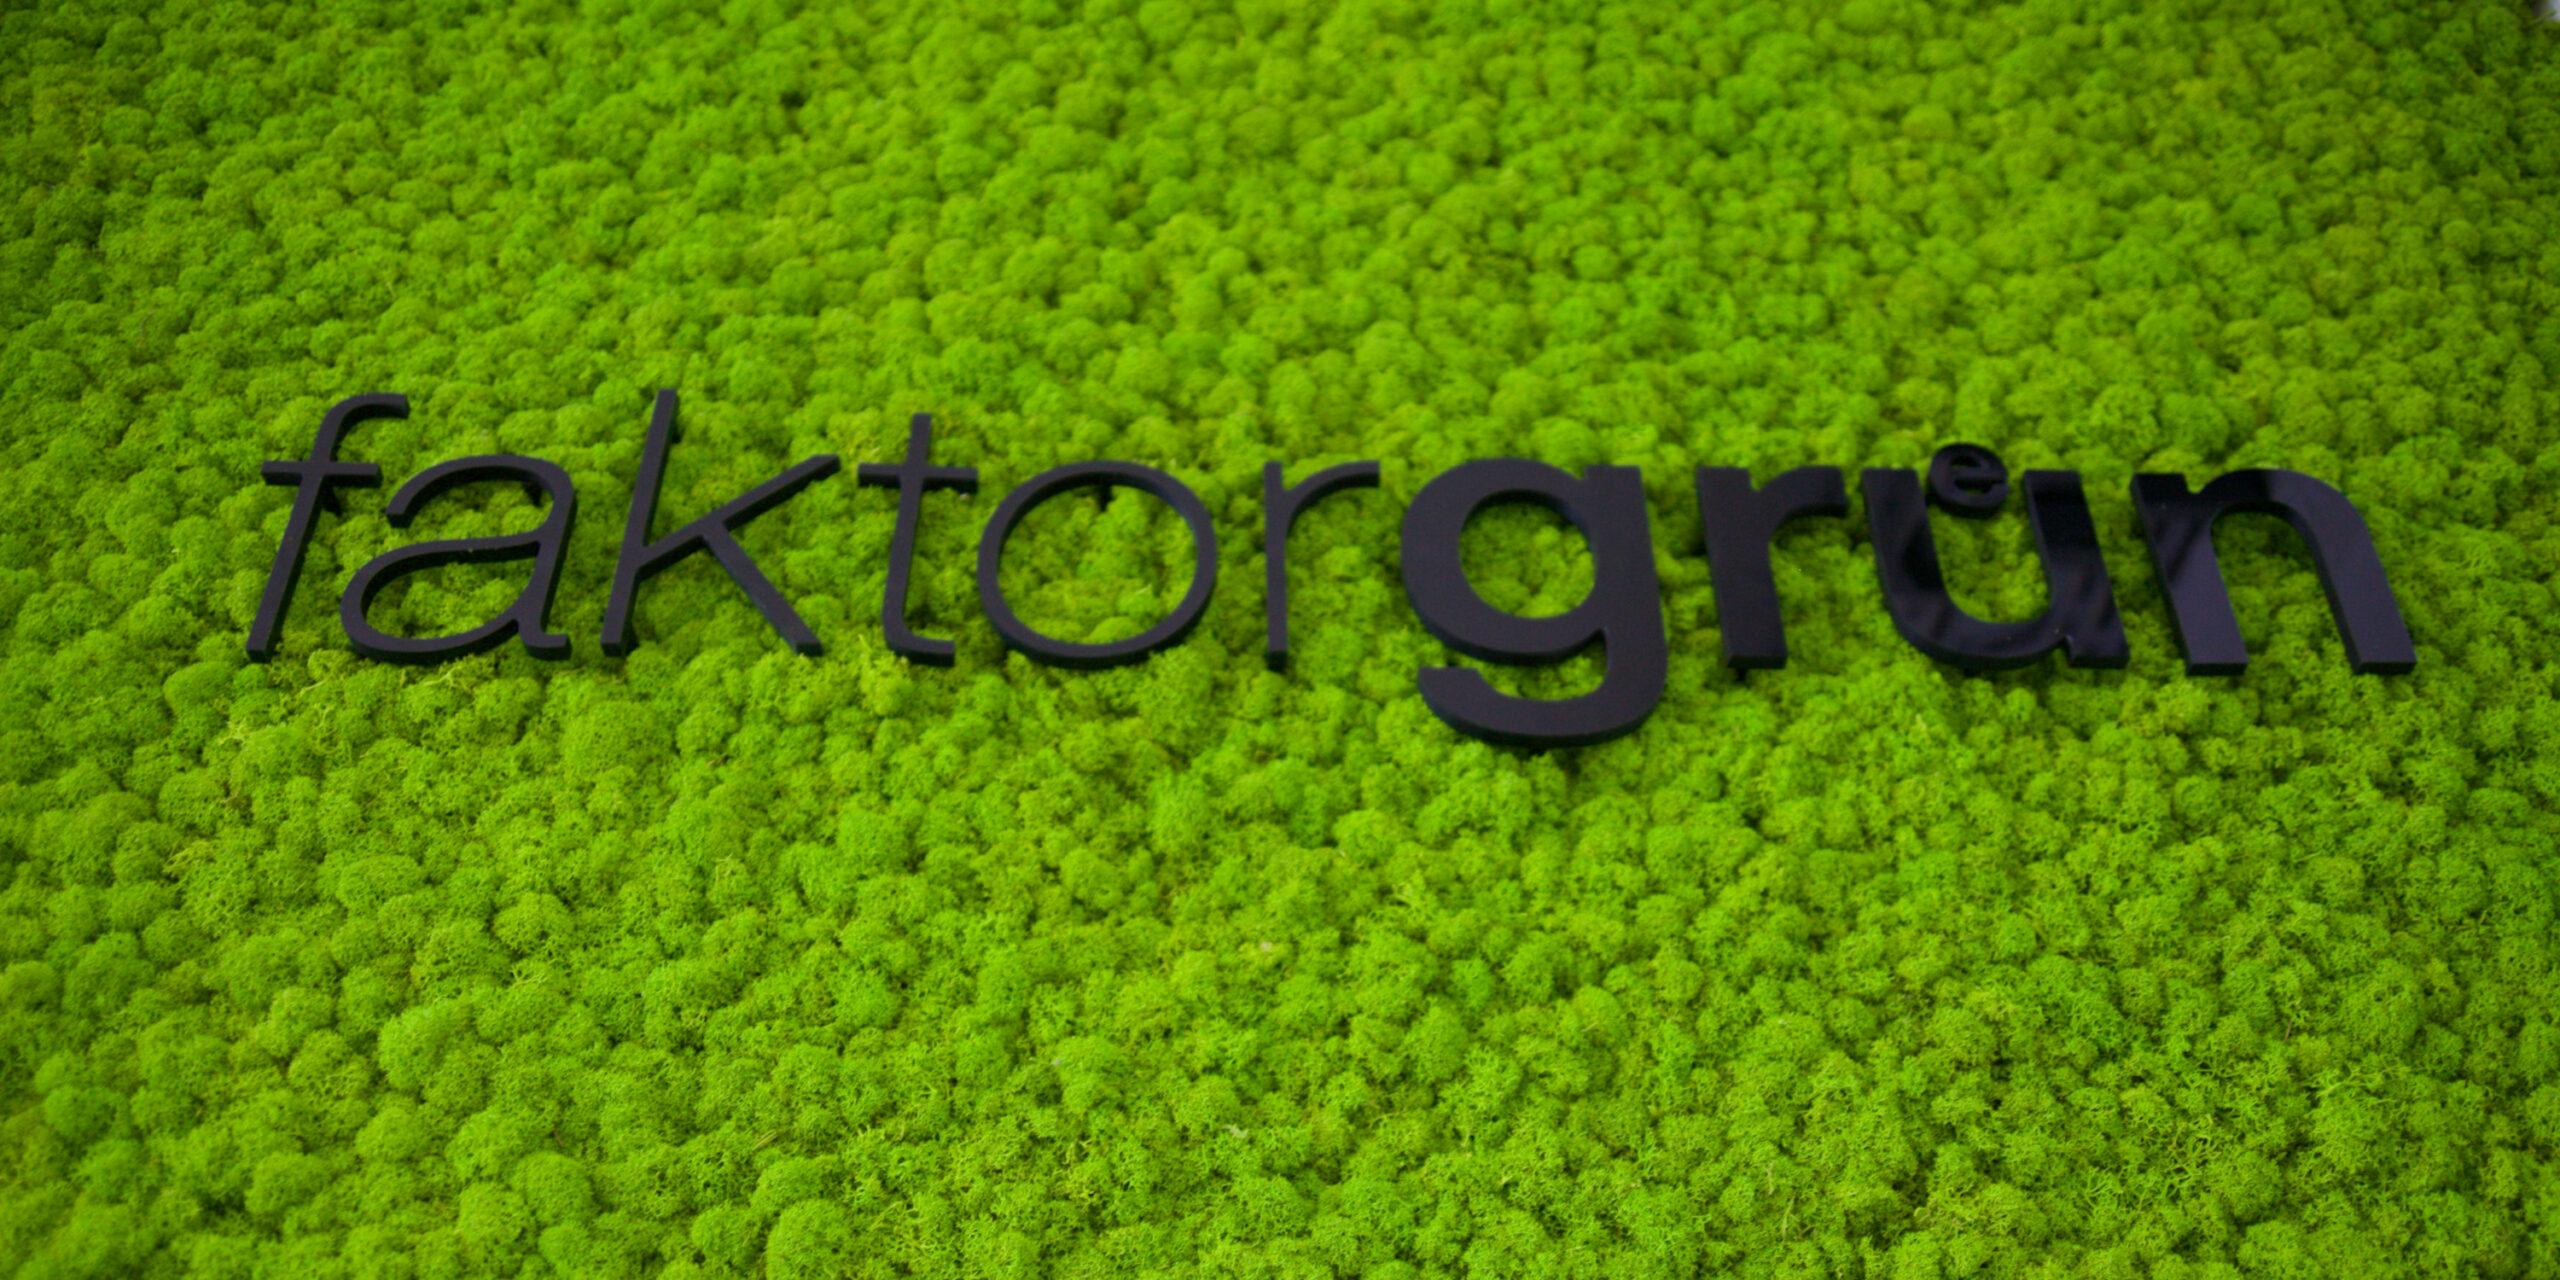 Naturador bei faktorgruen Logo auf Islandmoos